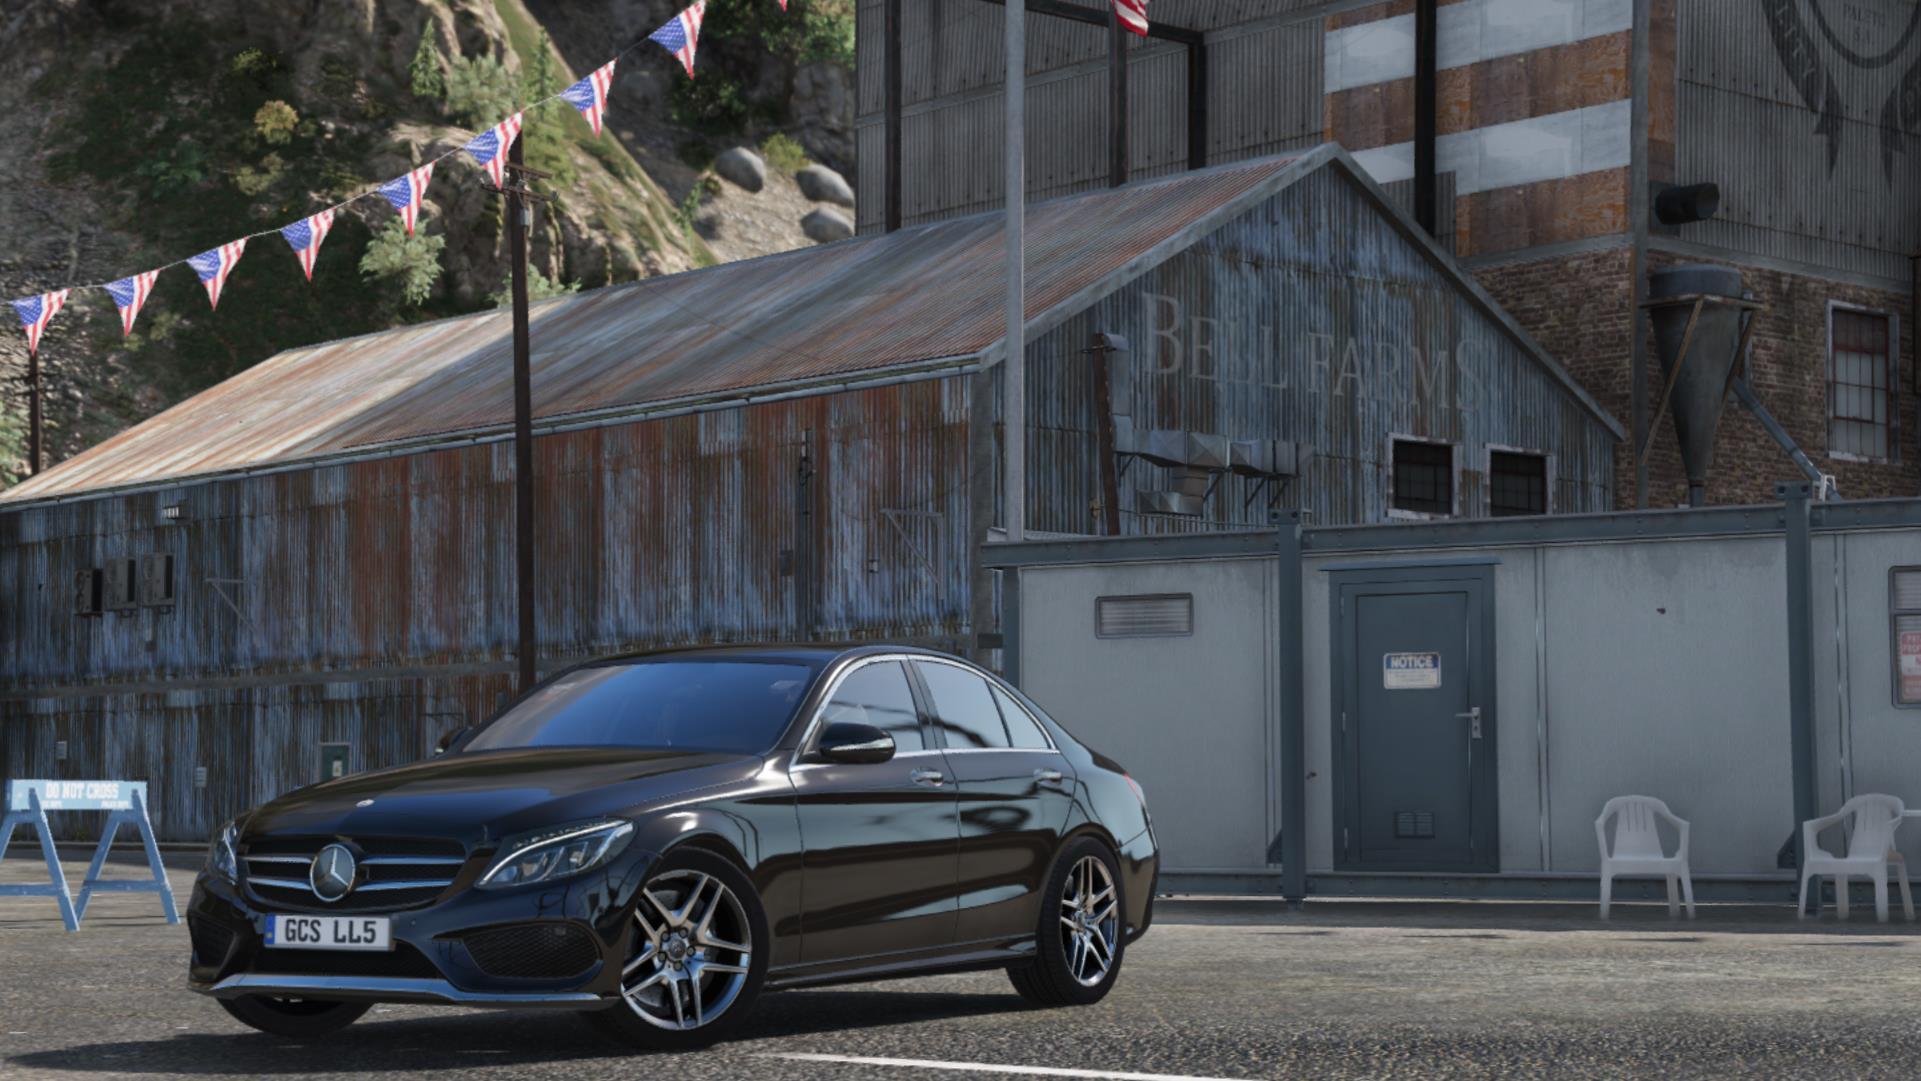 《GTA5》2014年梅赛德斯 - 奔驰C250